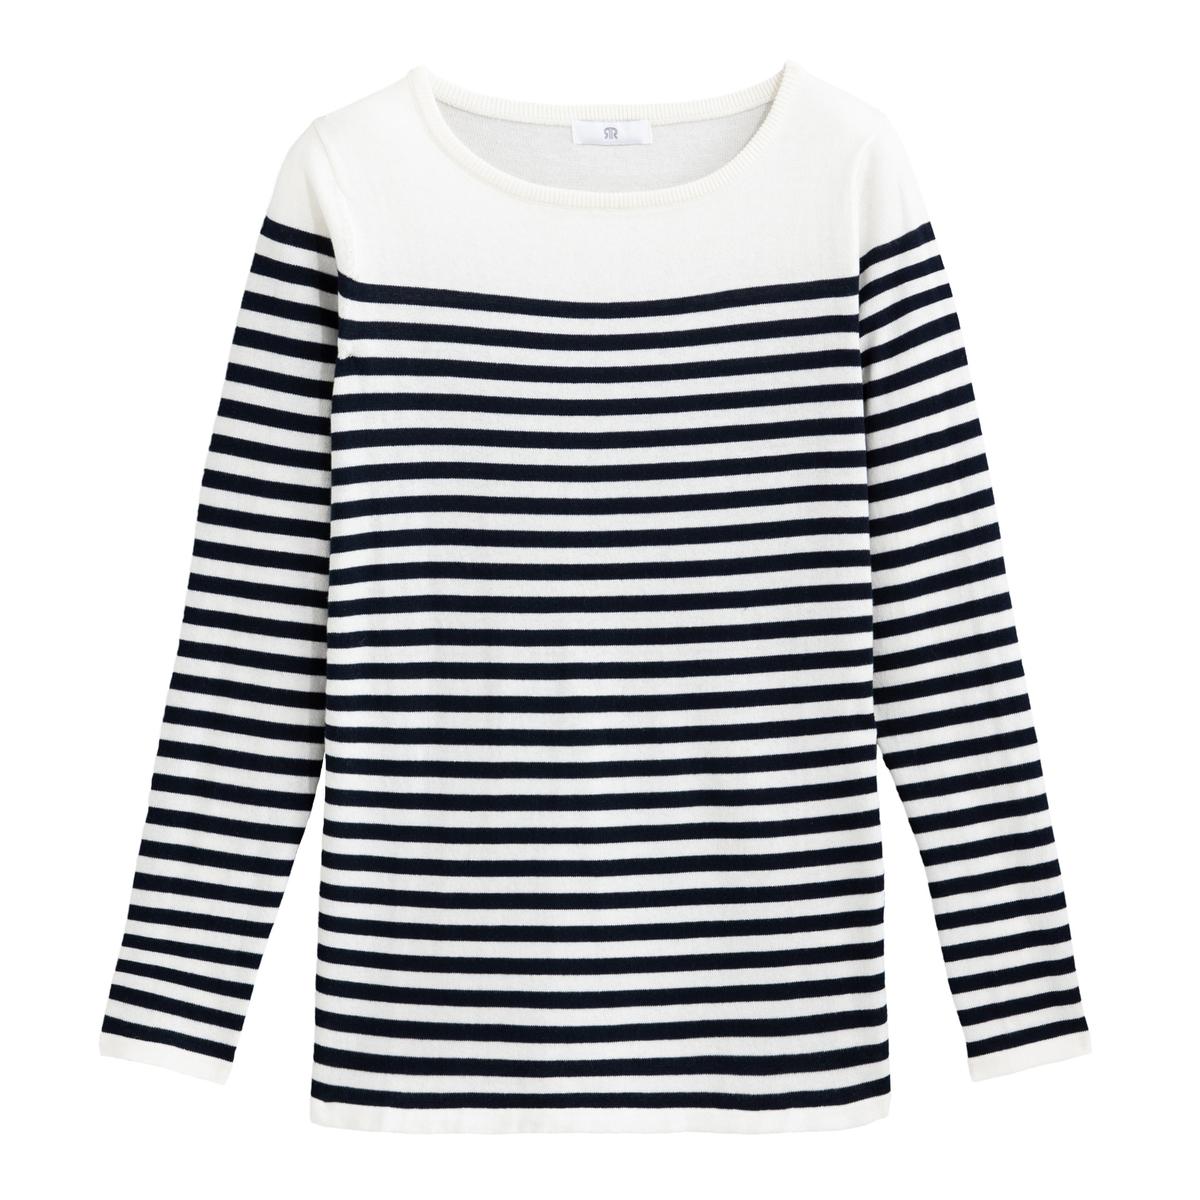 Jersey de embarazo con cuello barco, de punto fino a rayas